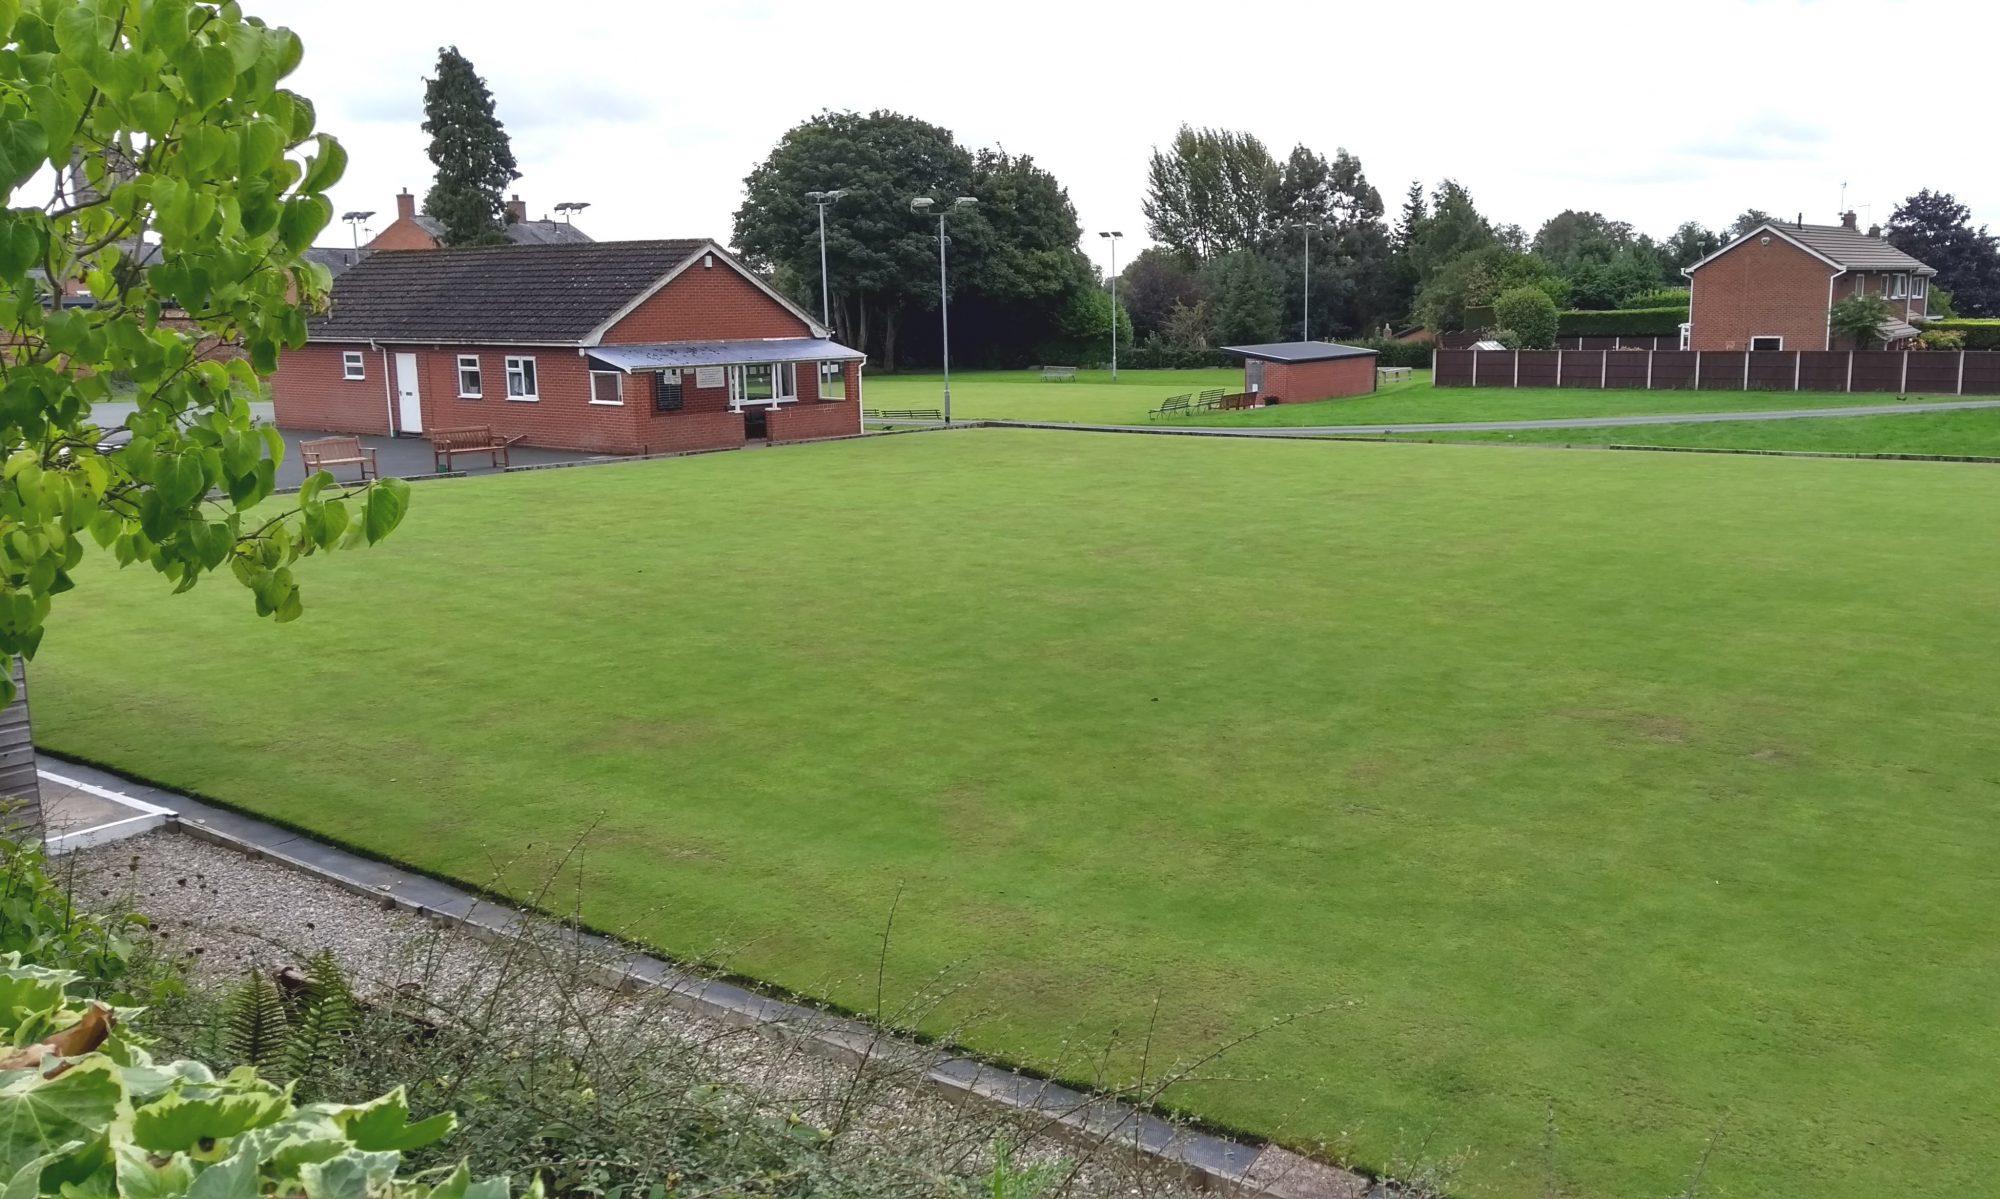 Chester Road Bowling Club